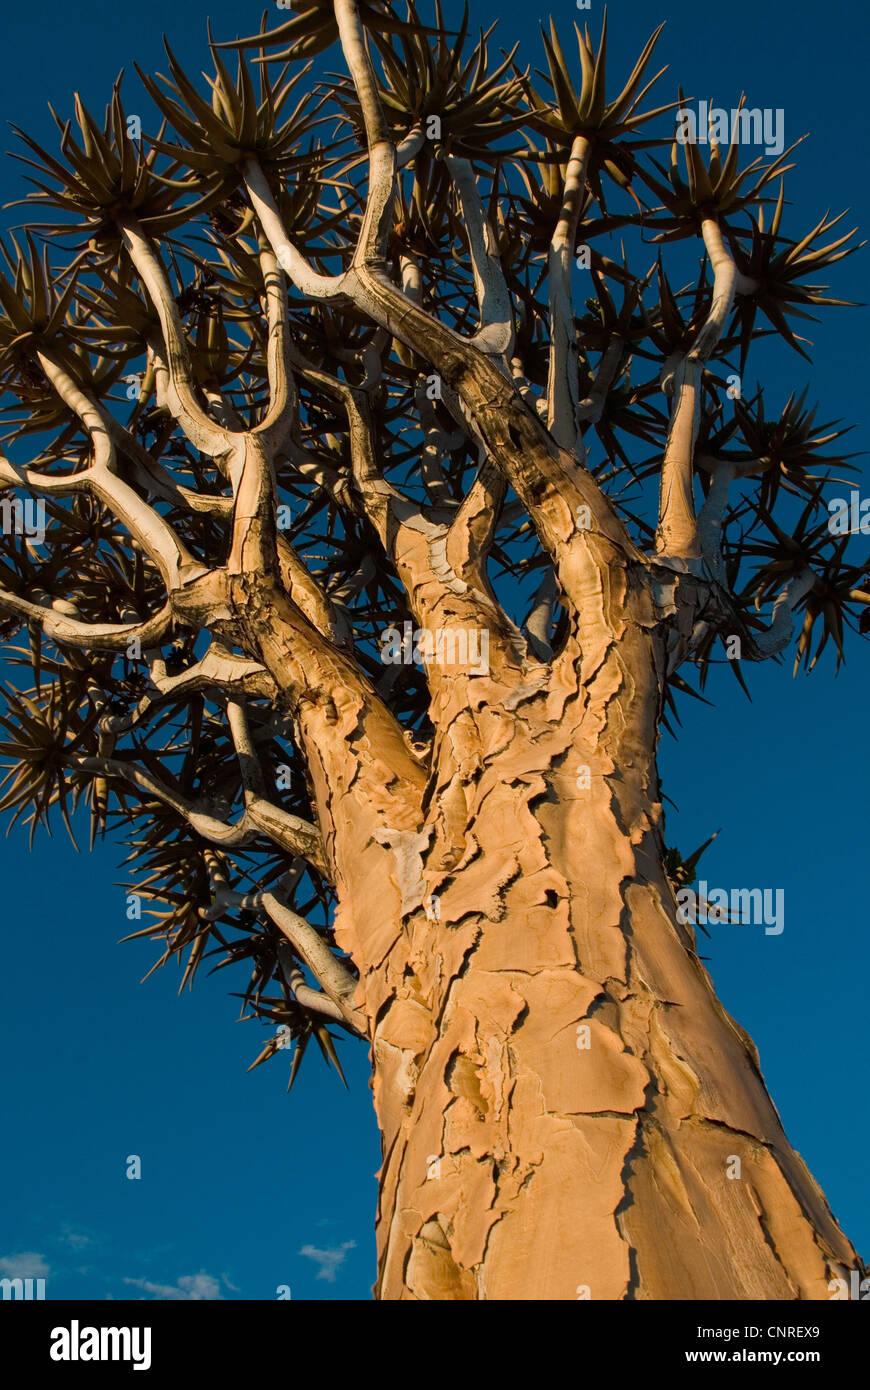 Kokerboom (Aloe dichotoma, quivertree), Namibie, Keetmanshoop Photo Stock